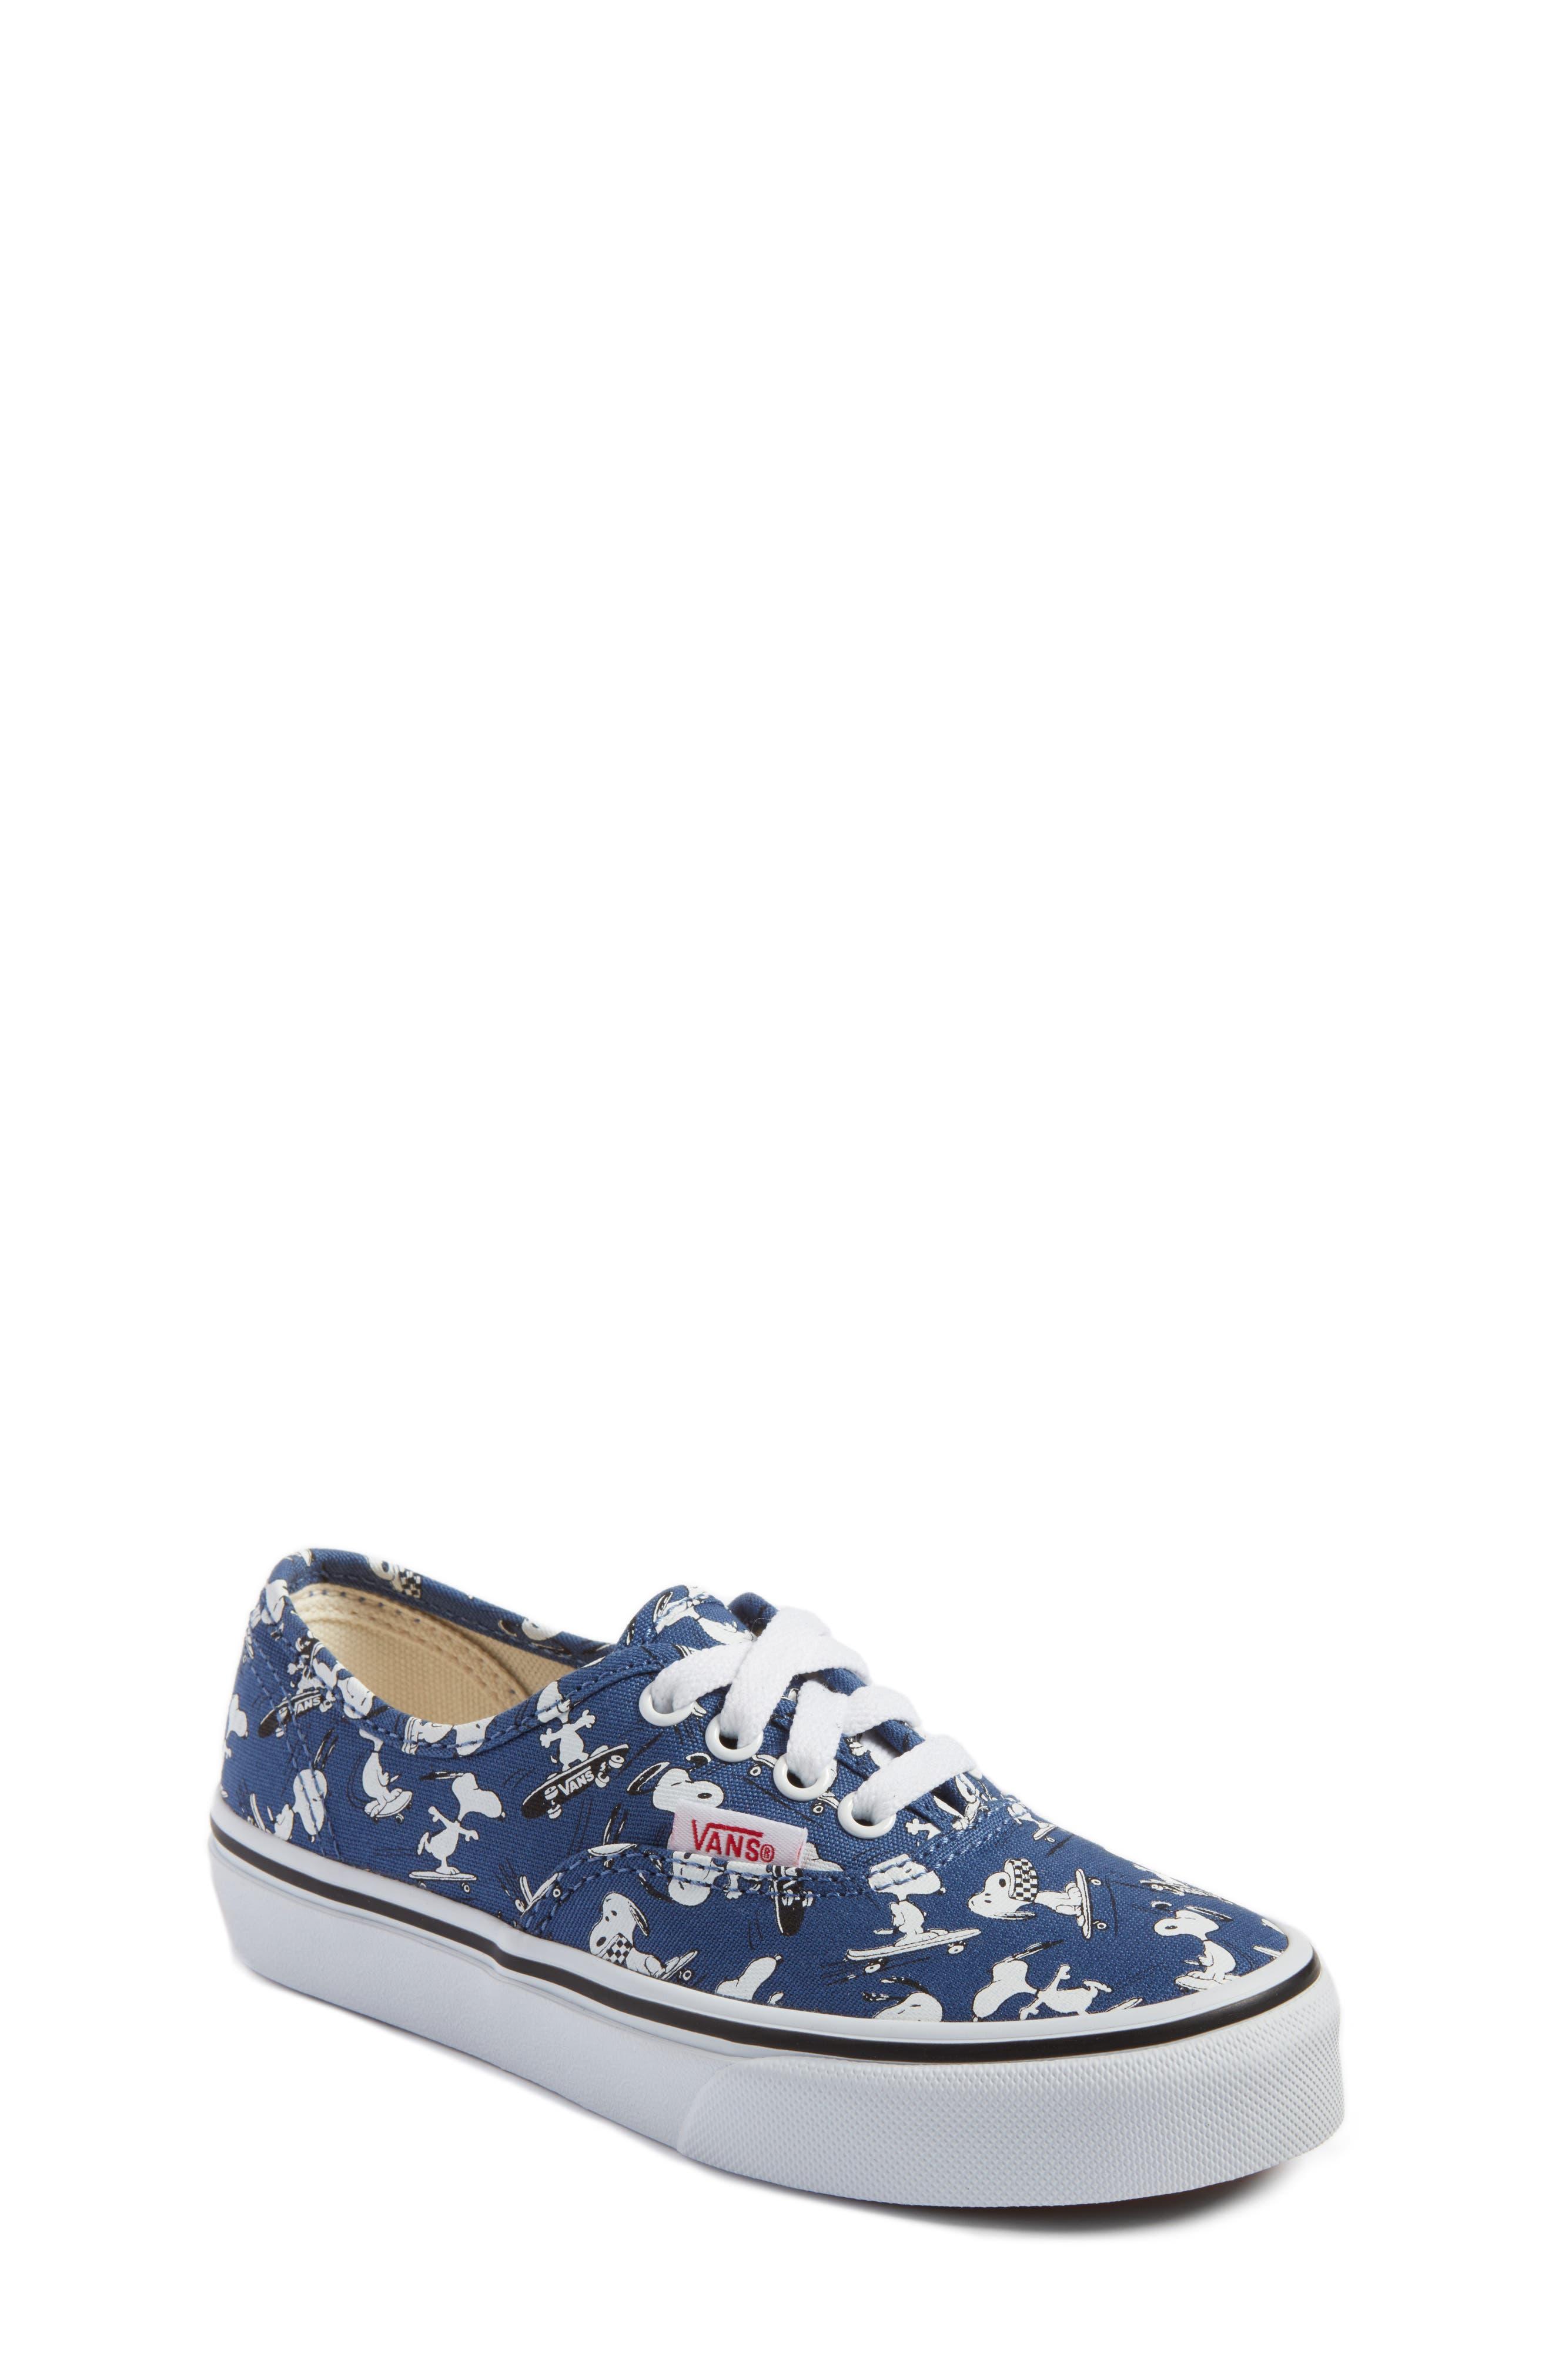 Vans x Peanuts Authentic Sneaker (Toddler, Little Kid & Big Kid)